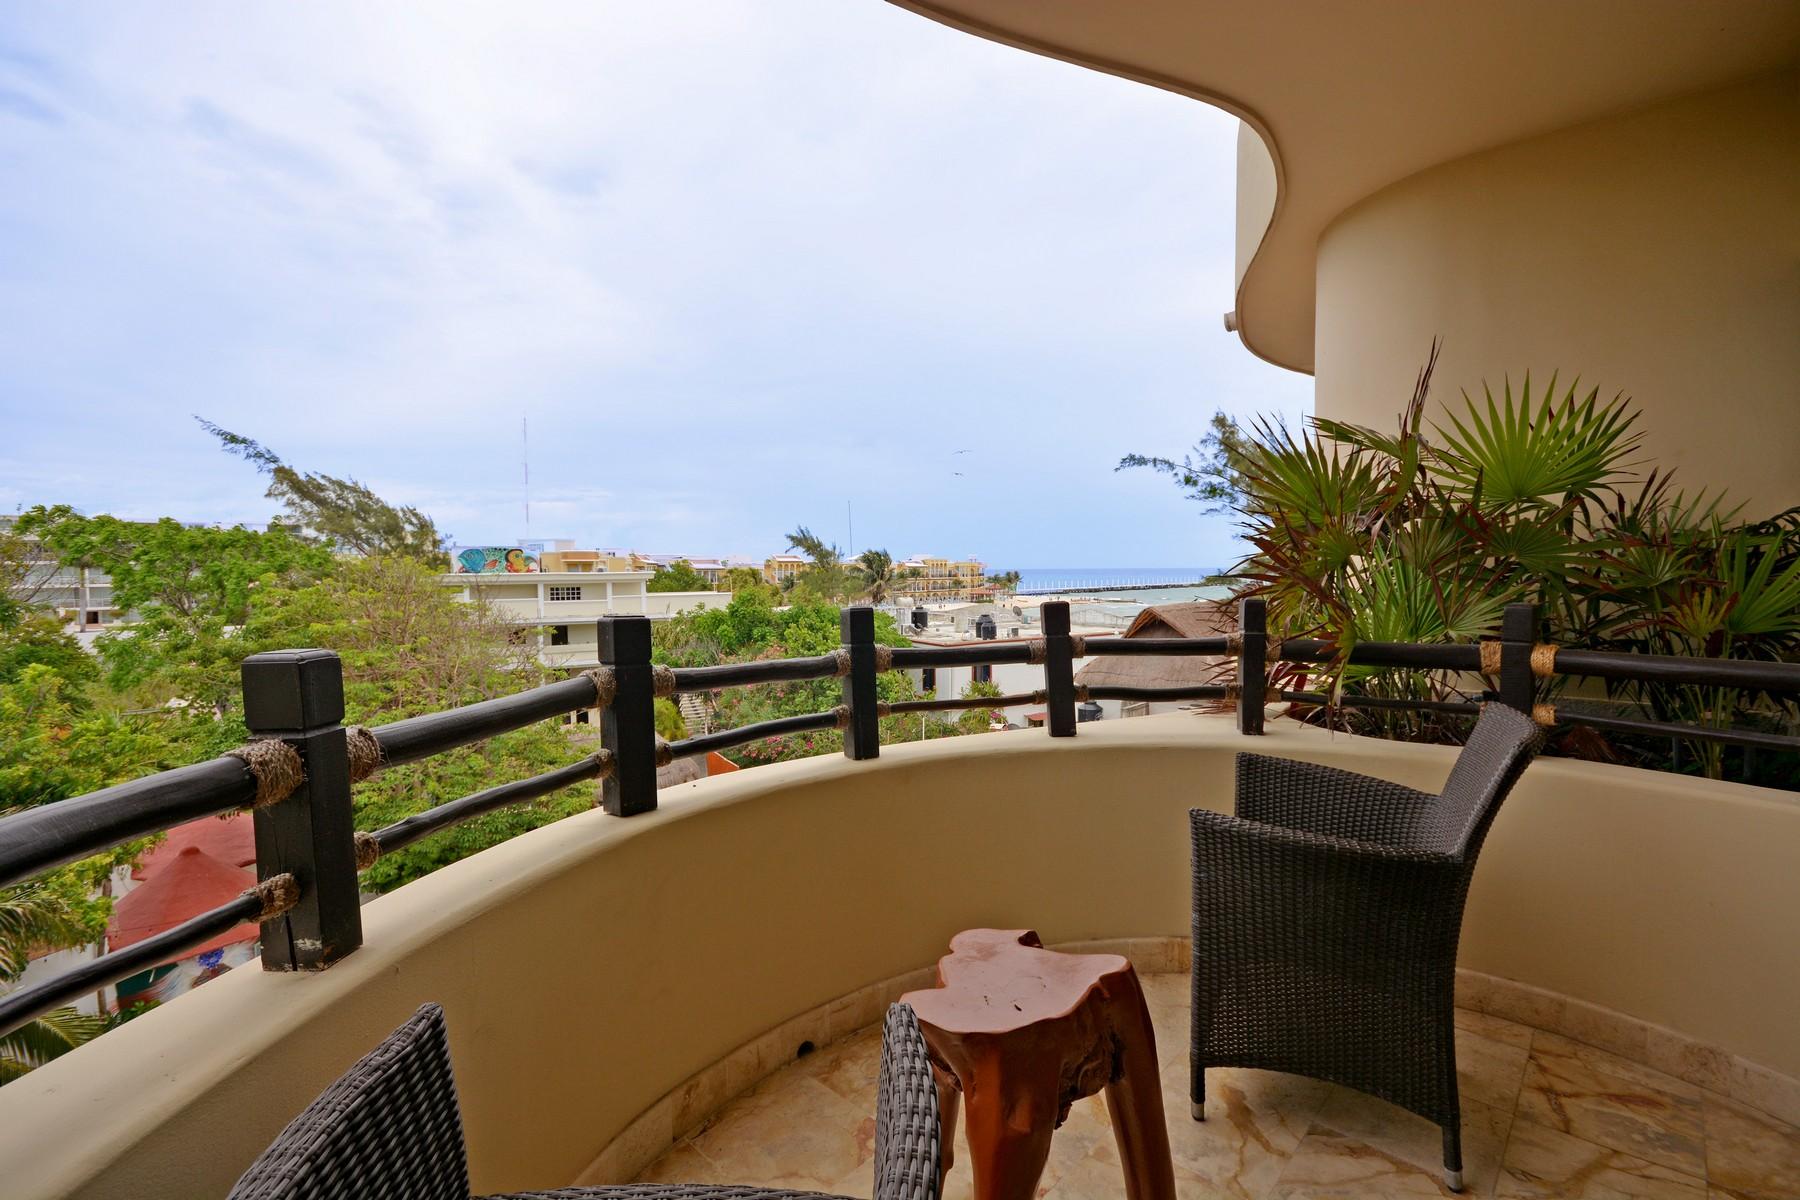 Nhà chung cư vì Bán tại INSPIRING BEACHFRONT APARTMENT Oceanfront, 3rd Level, El Taj Calle 1era Nte, entre 12 y 14 Nte. Playa Del Carmen, Quintana Roo, 77710 Mexico